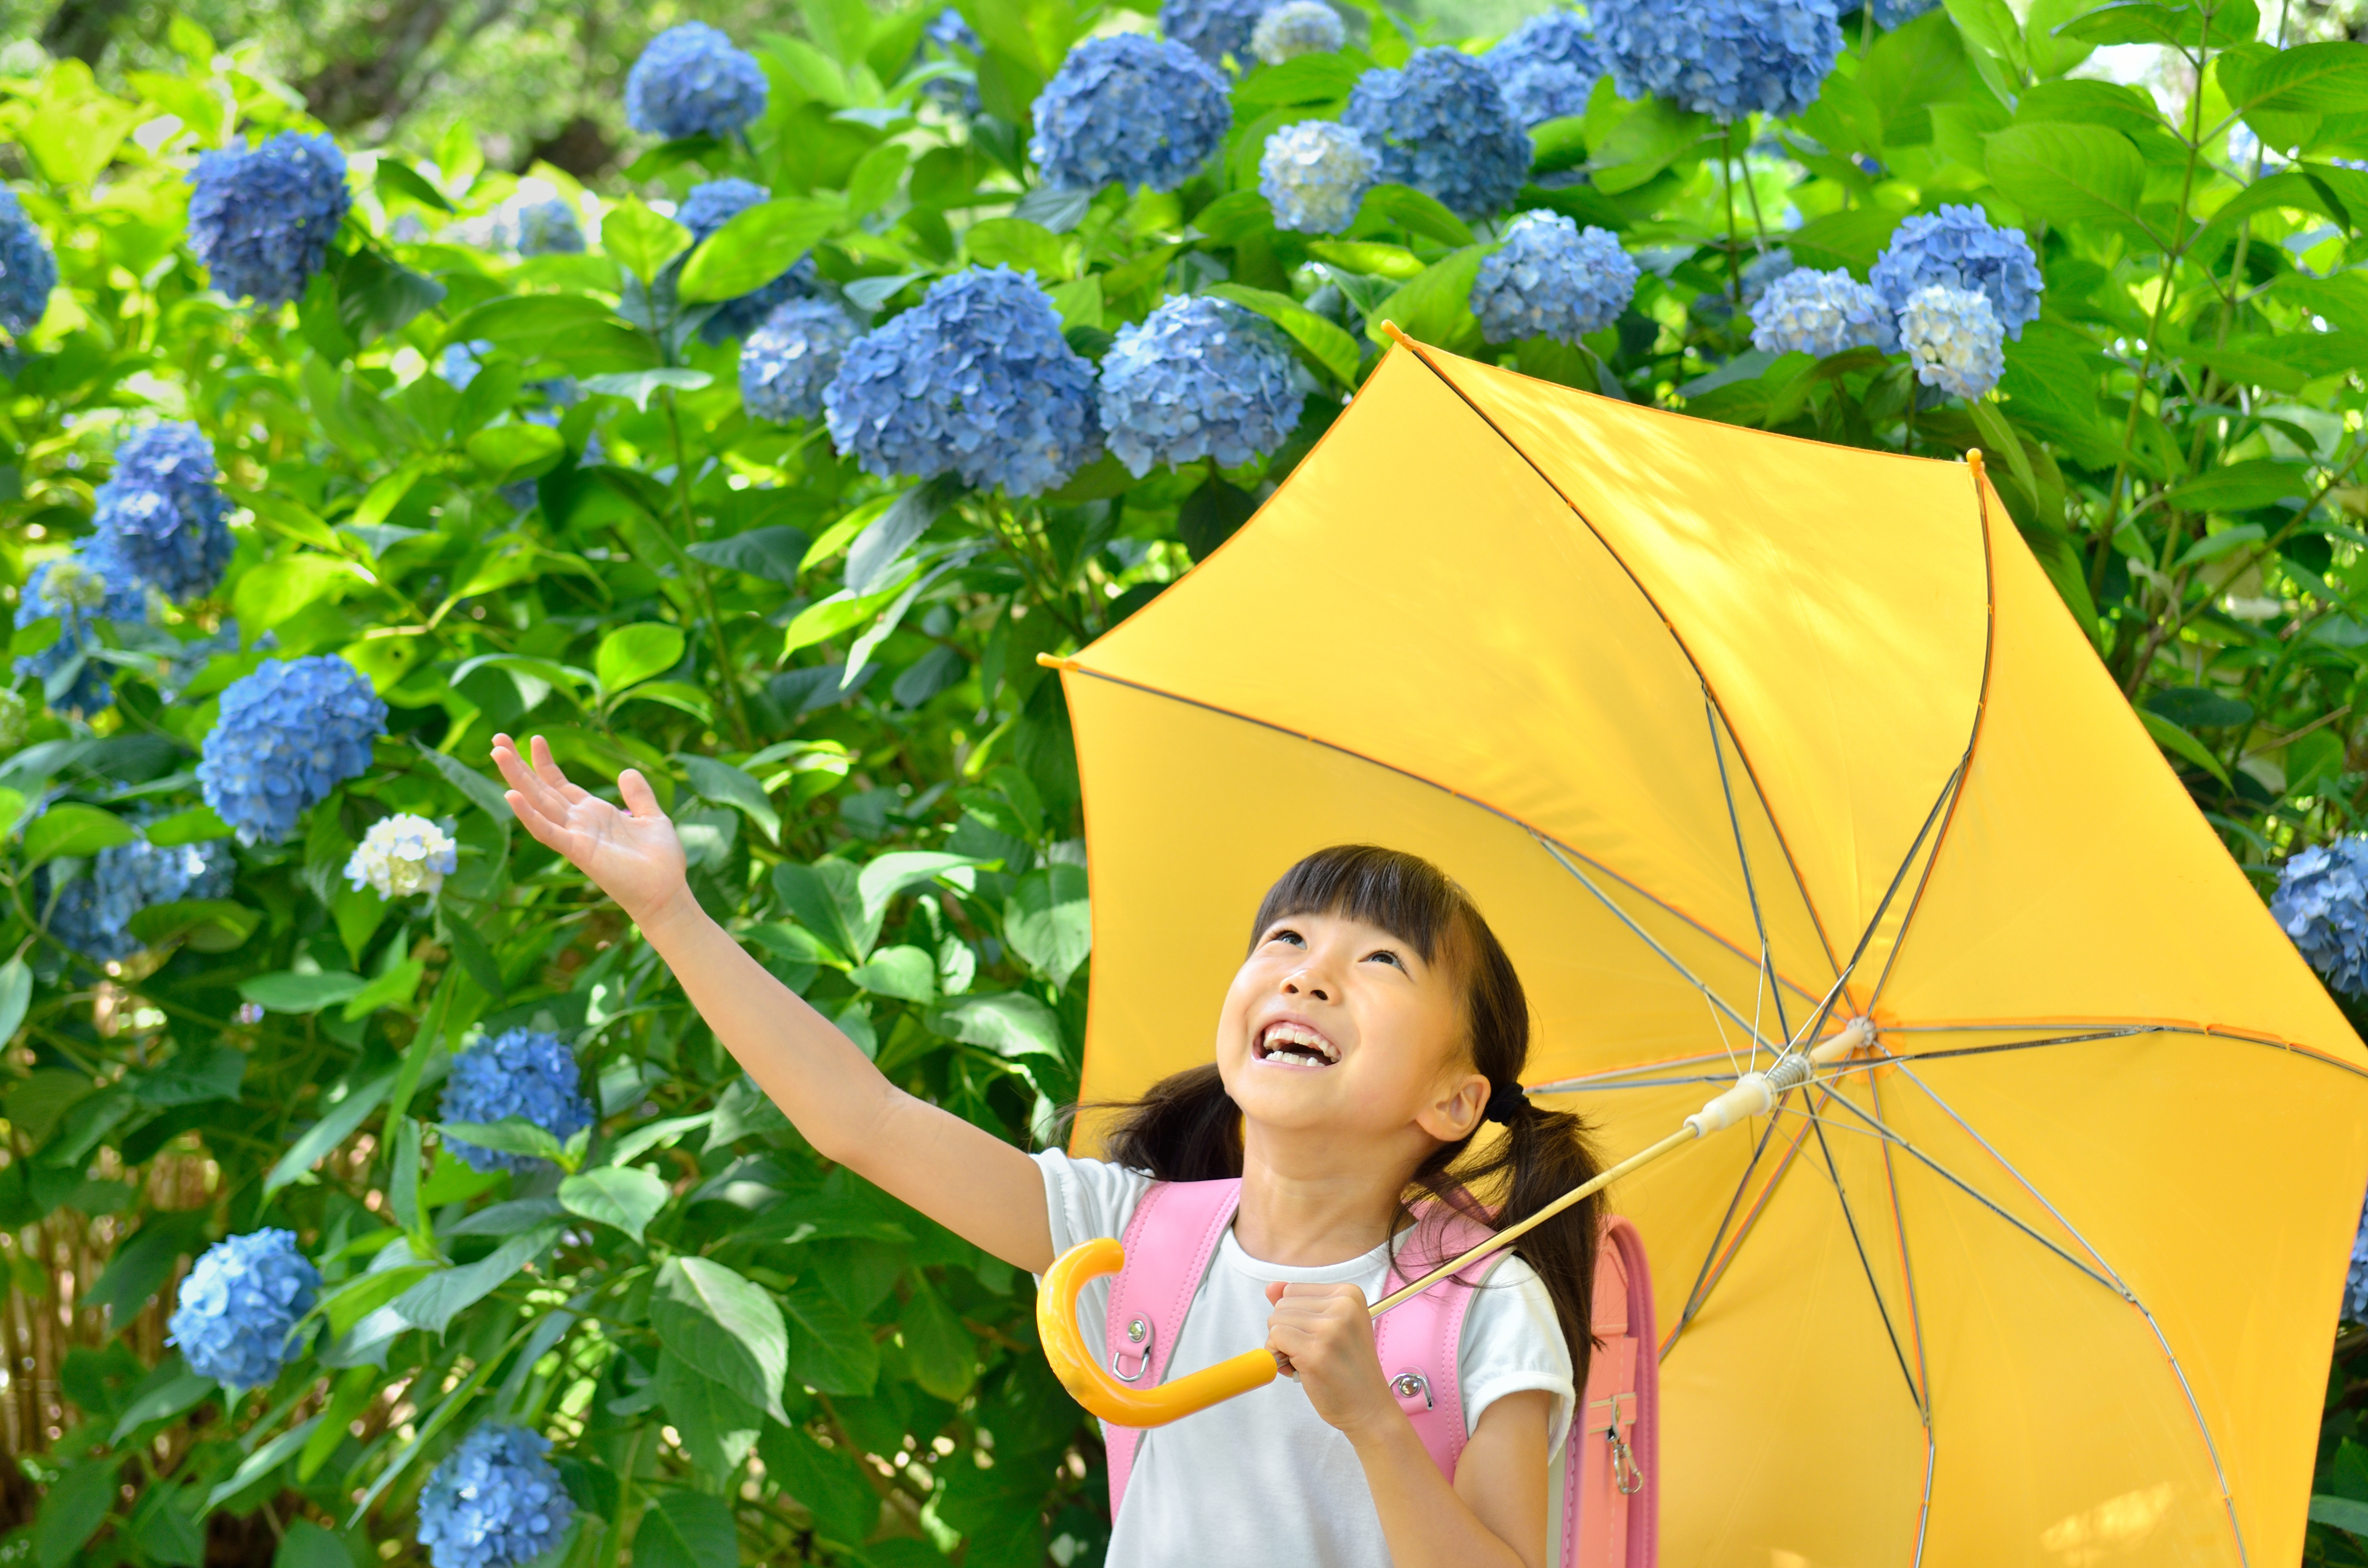 elementary school student puts up a yellow umbrella around blue flowers